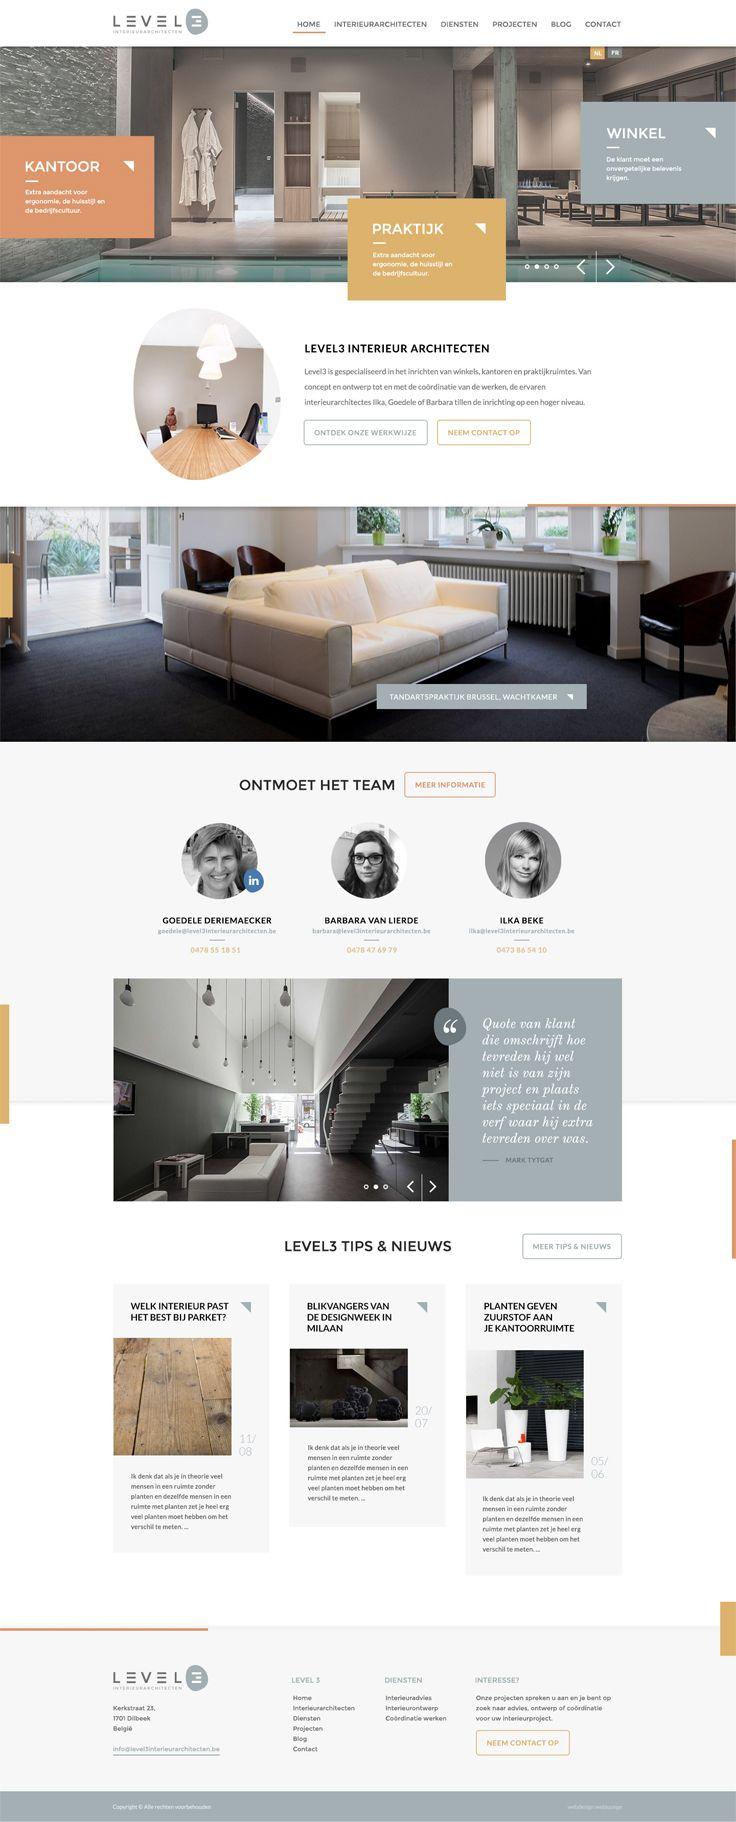 Website for Level3 interior architects - Designed by Weblounge…